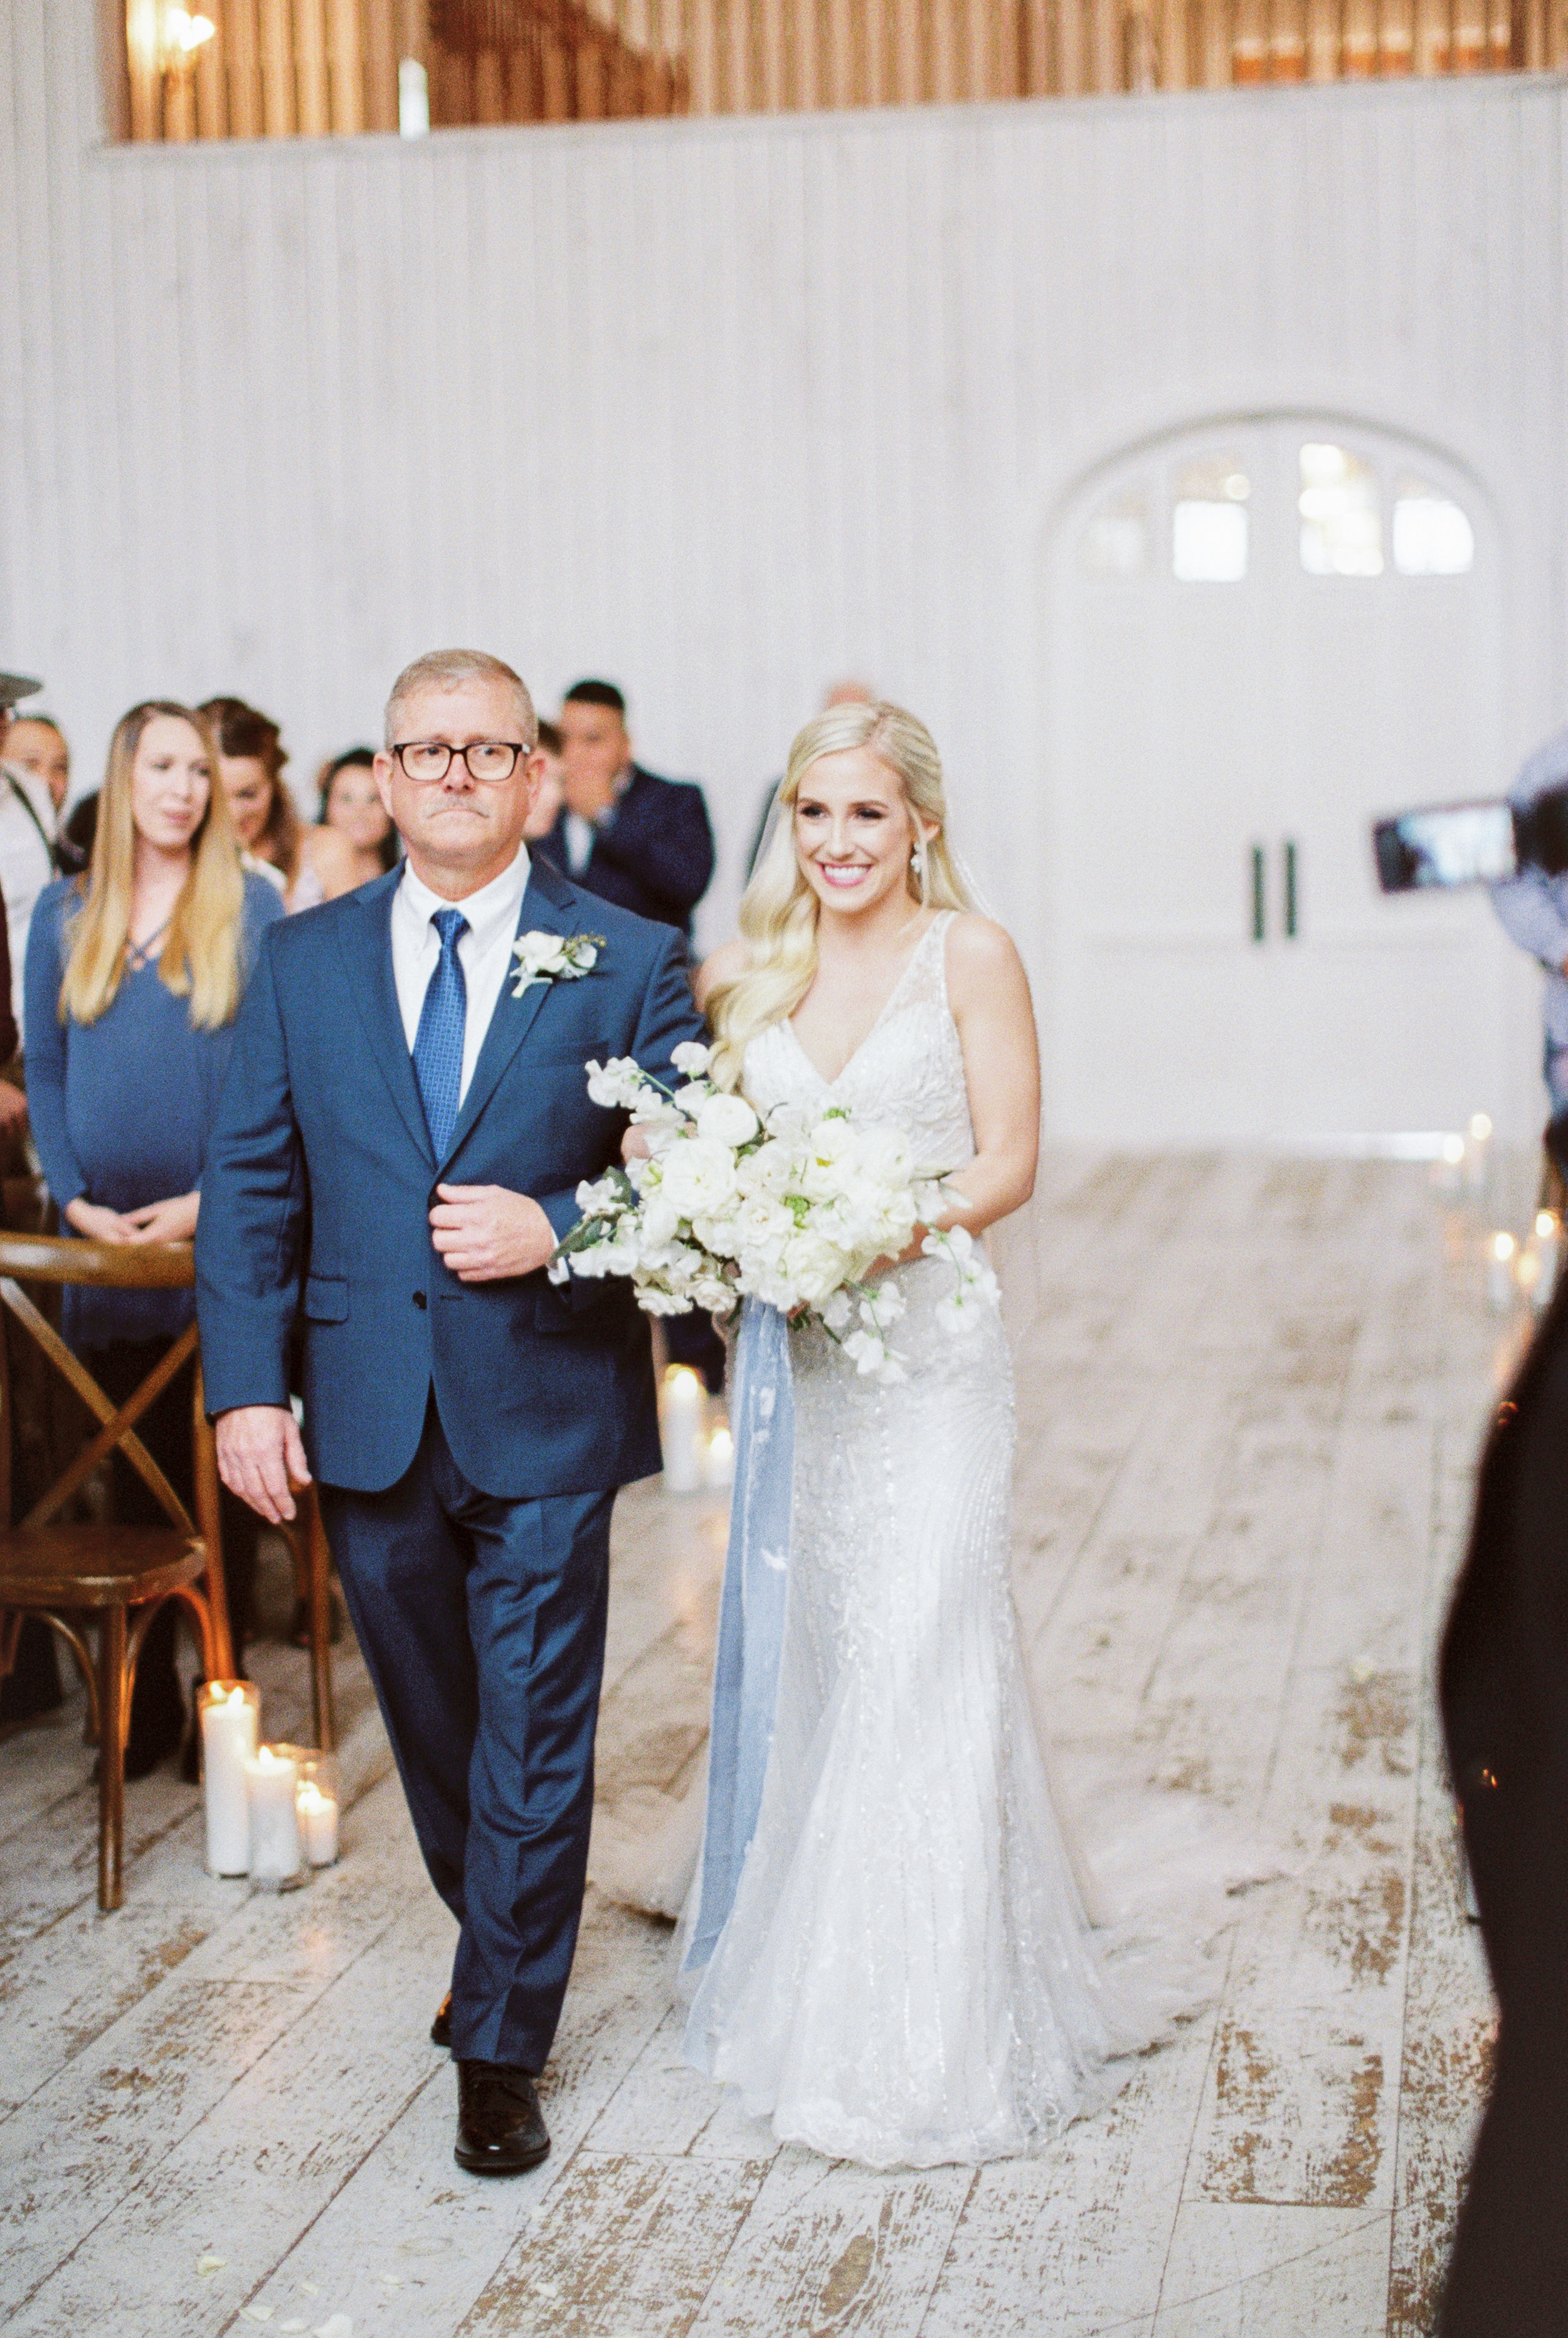 Chloe+Austin Wedding_298.JPG